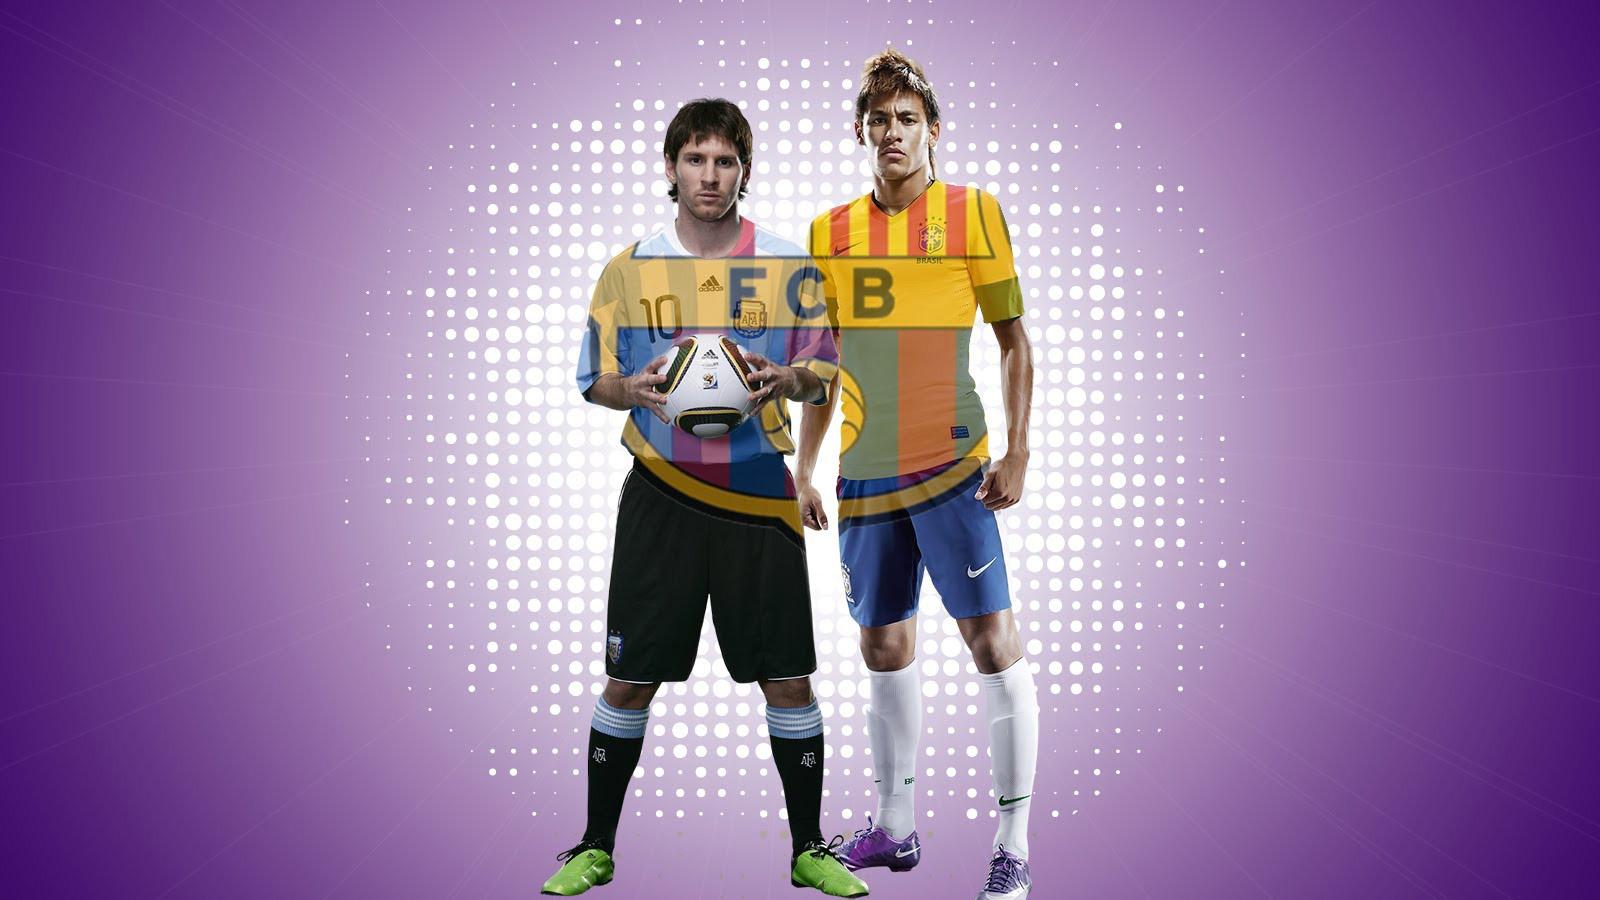 Neymar and Messi wallpaper   FC Barcelona 2013 2014 neymarjrnet 1600x900